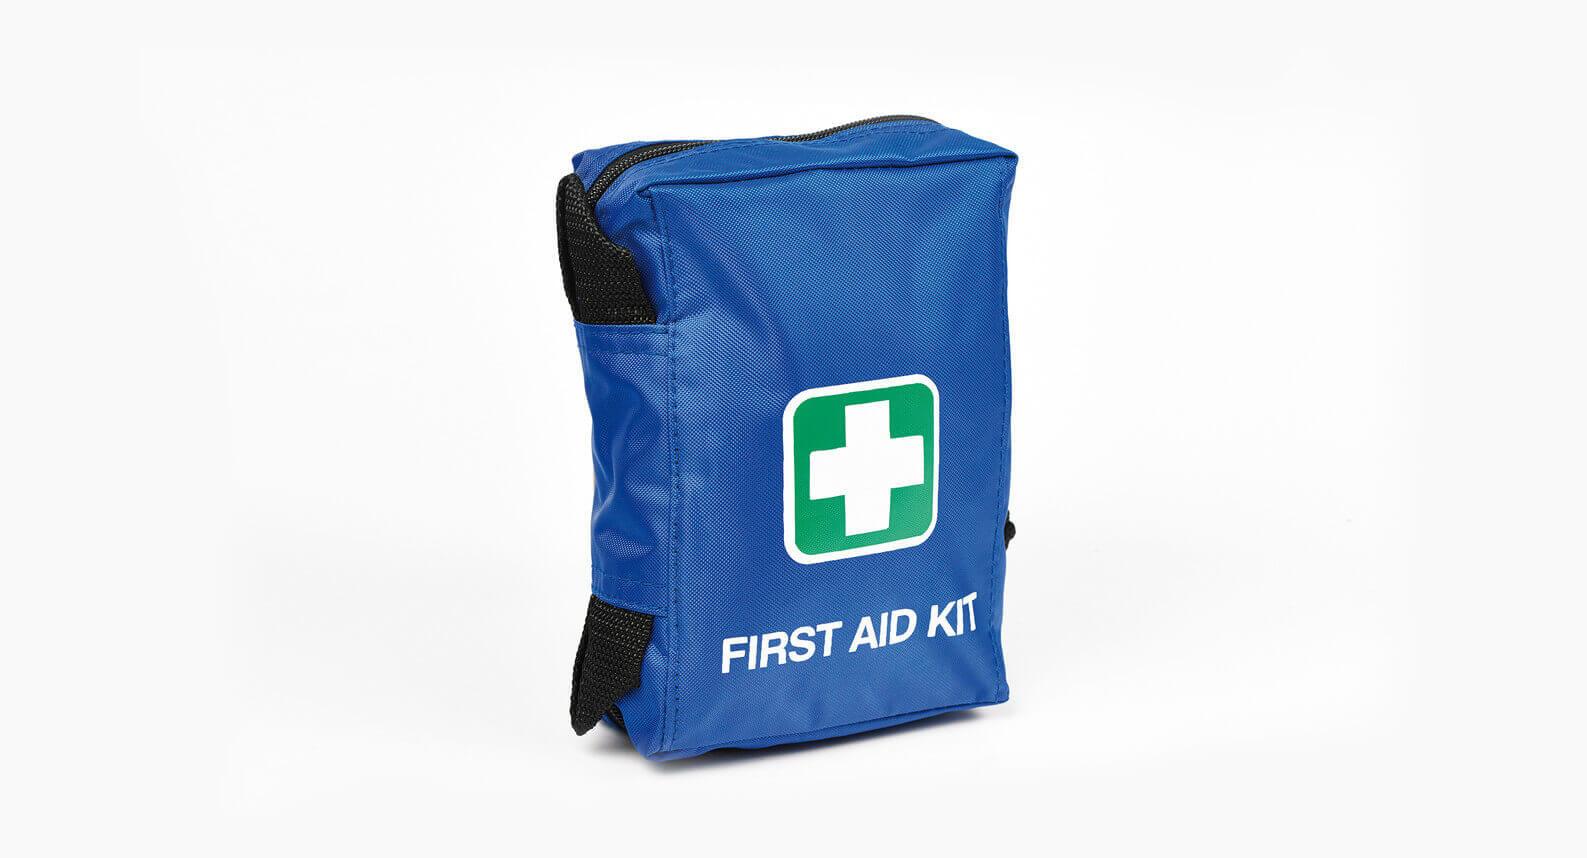 Vitara First Aid Kit - Small